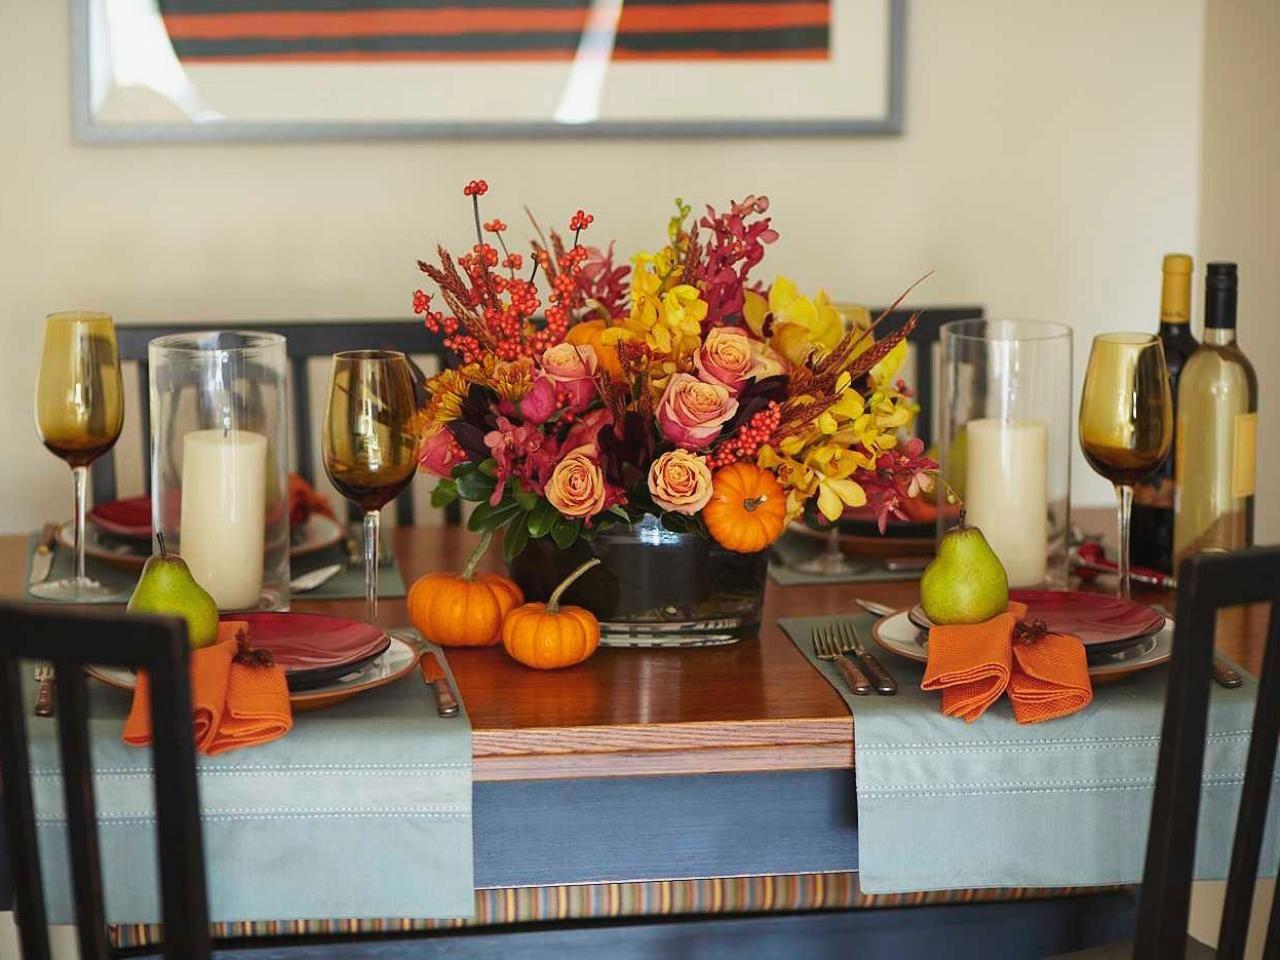 15 Stylish Thanksgiving Table Settings Dinner TablesThanksgiving SettingsThanksgiving CenterpiecesFall